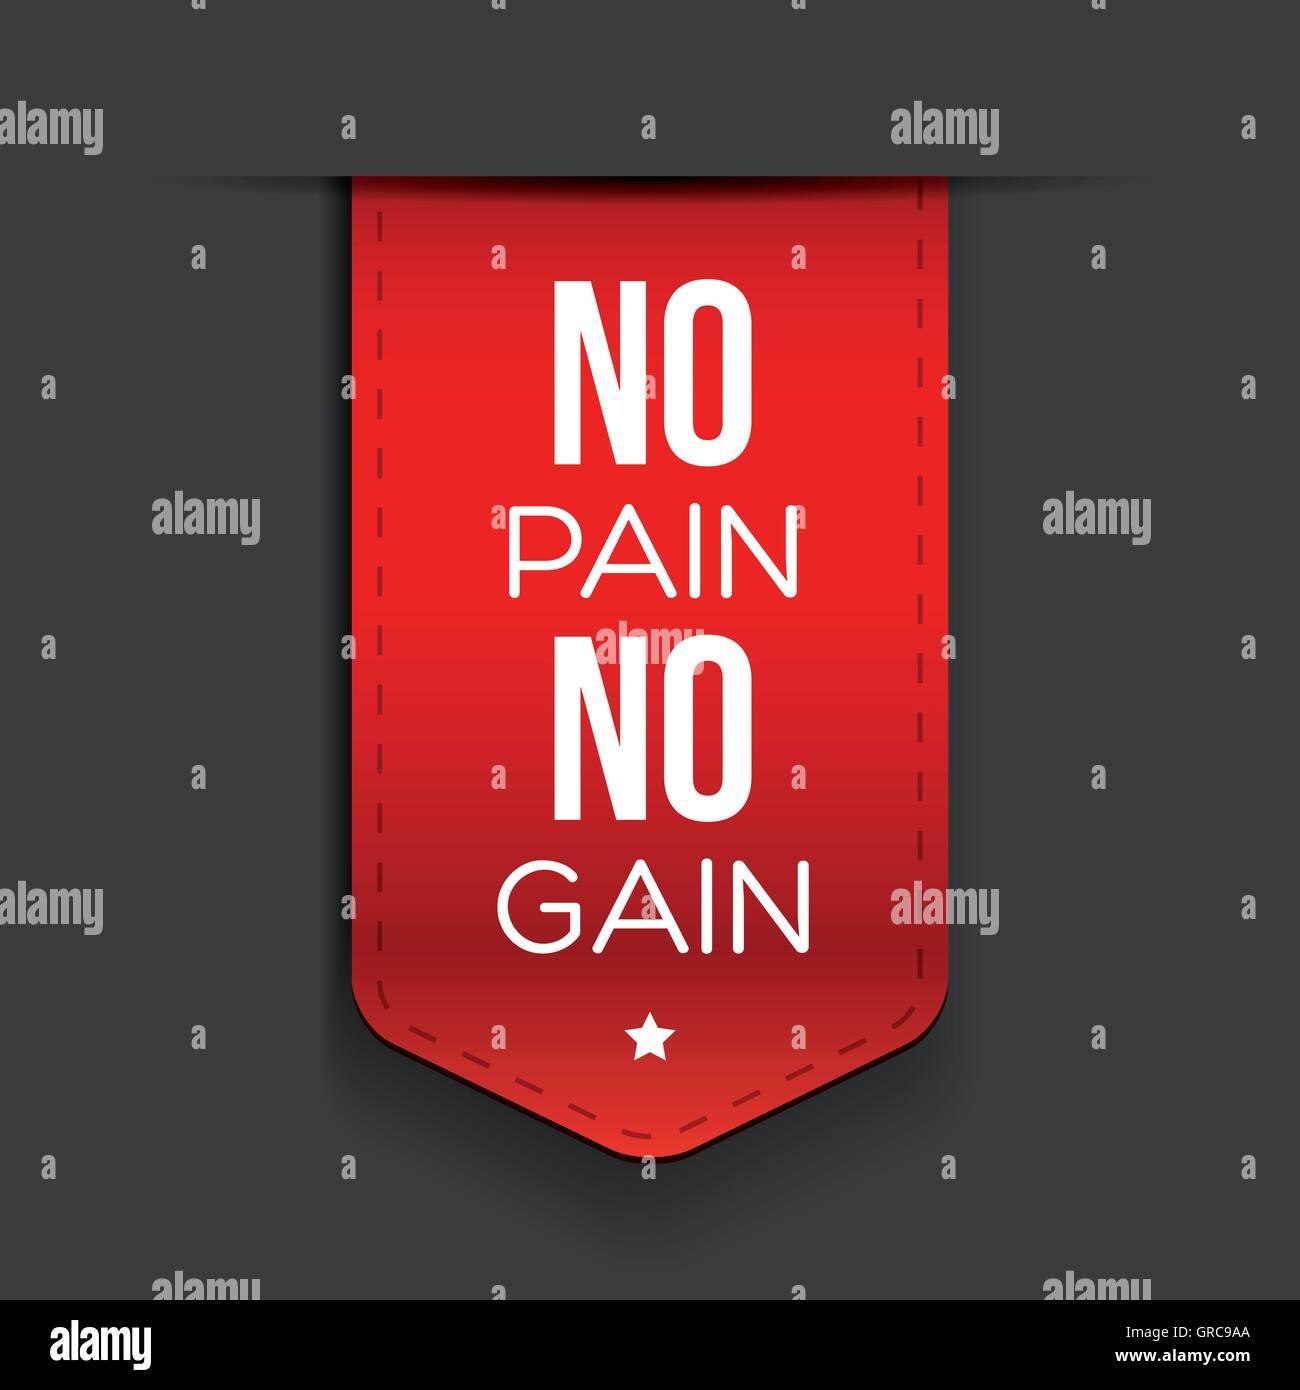 No Pain No Gain Inspirational Quote Stock Photos No Pain No Gain